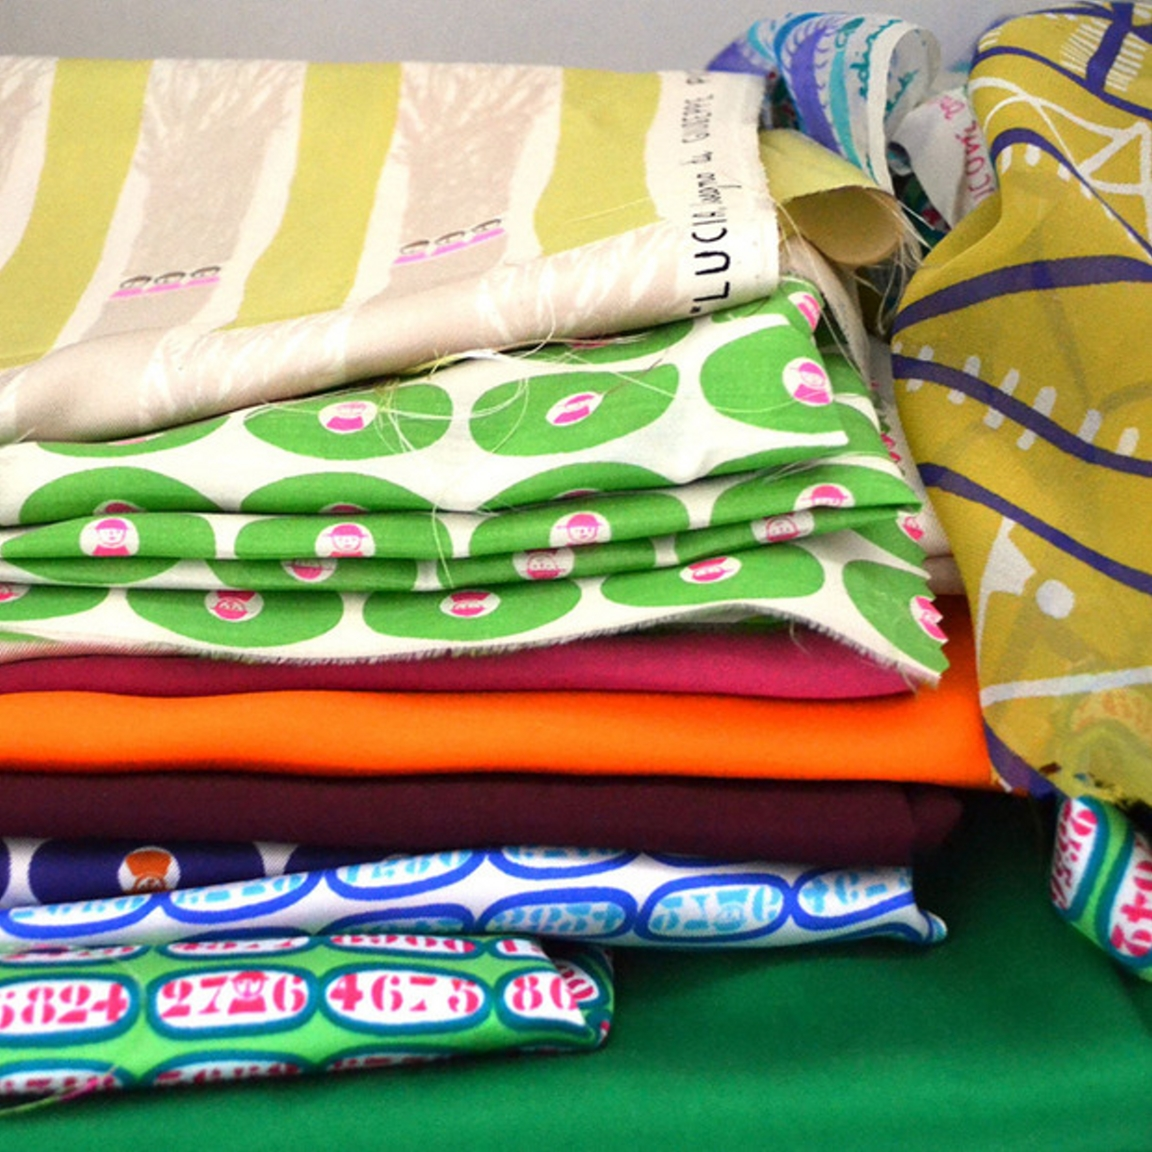 giuseppe picone textiles (8)